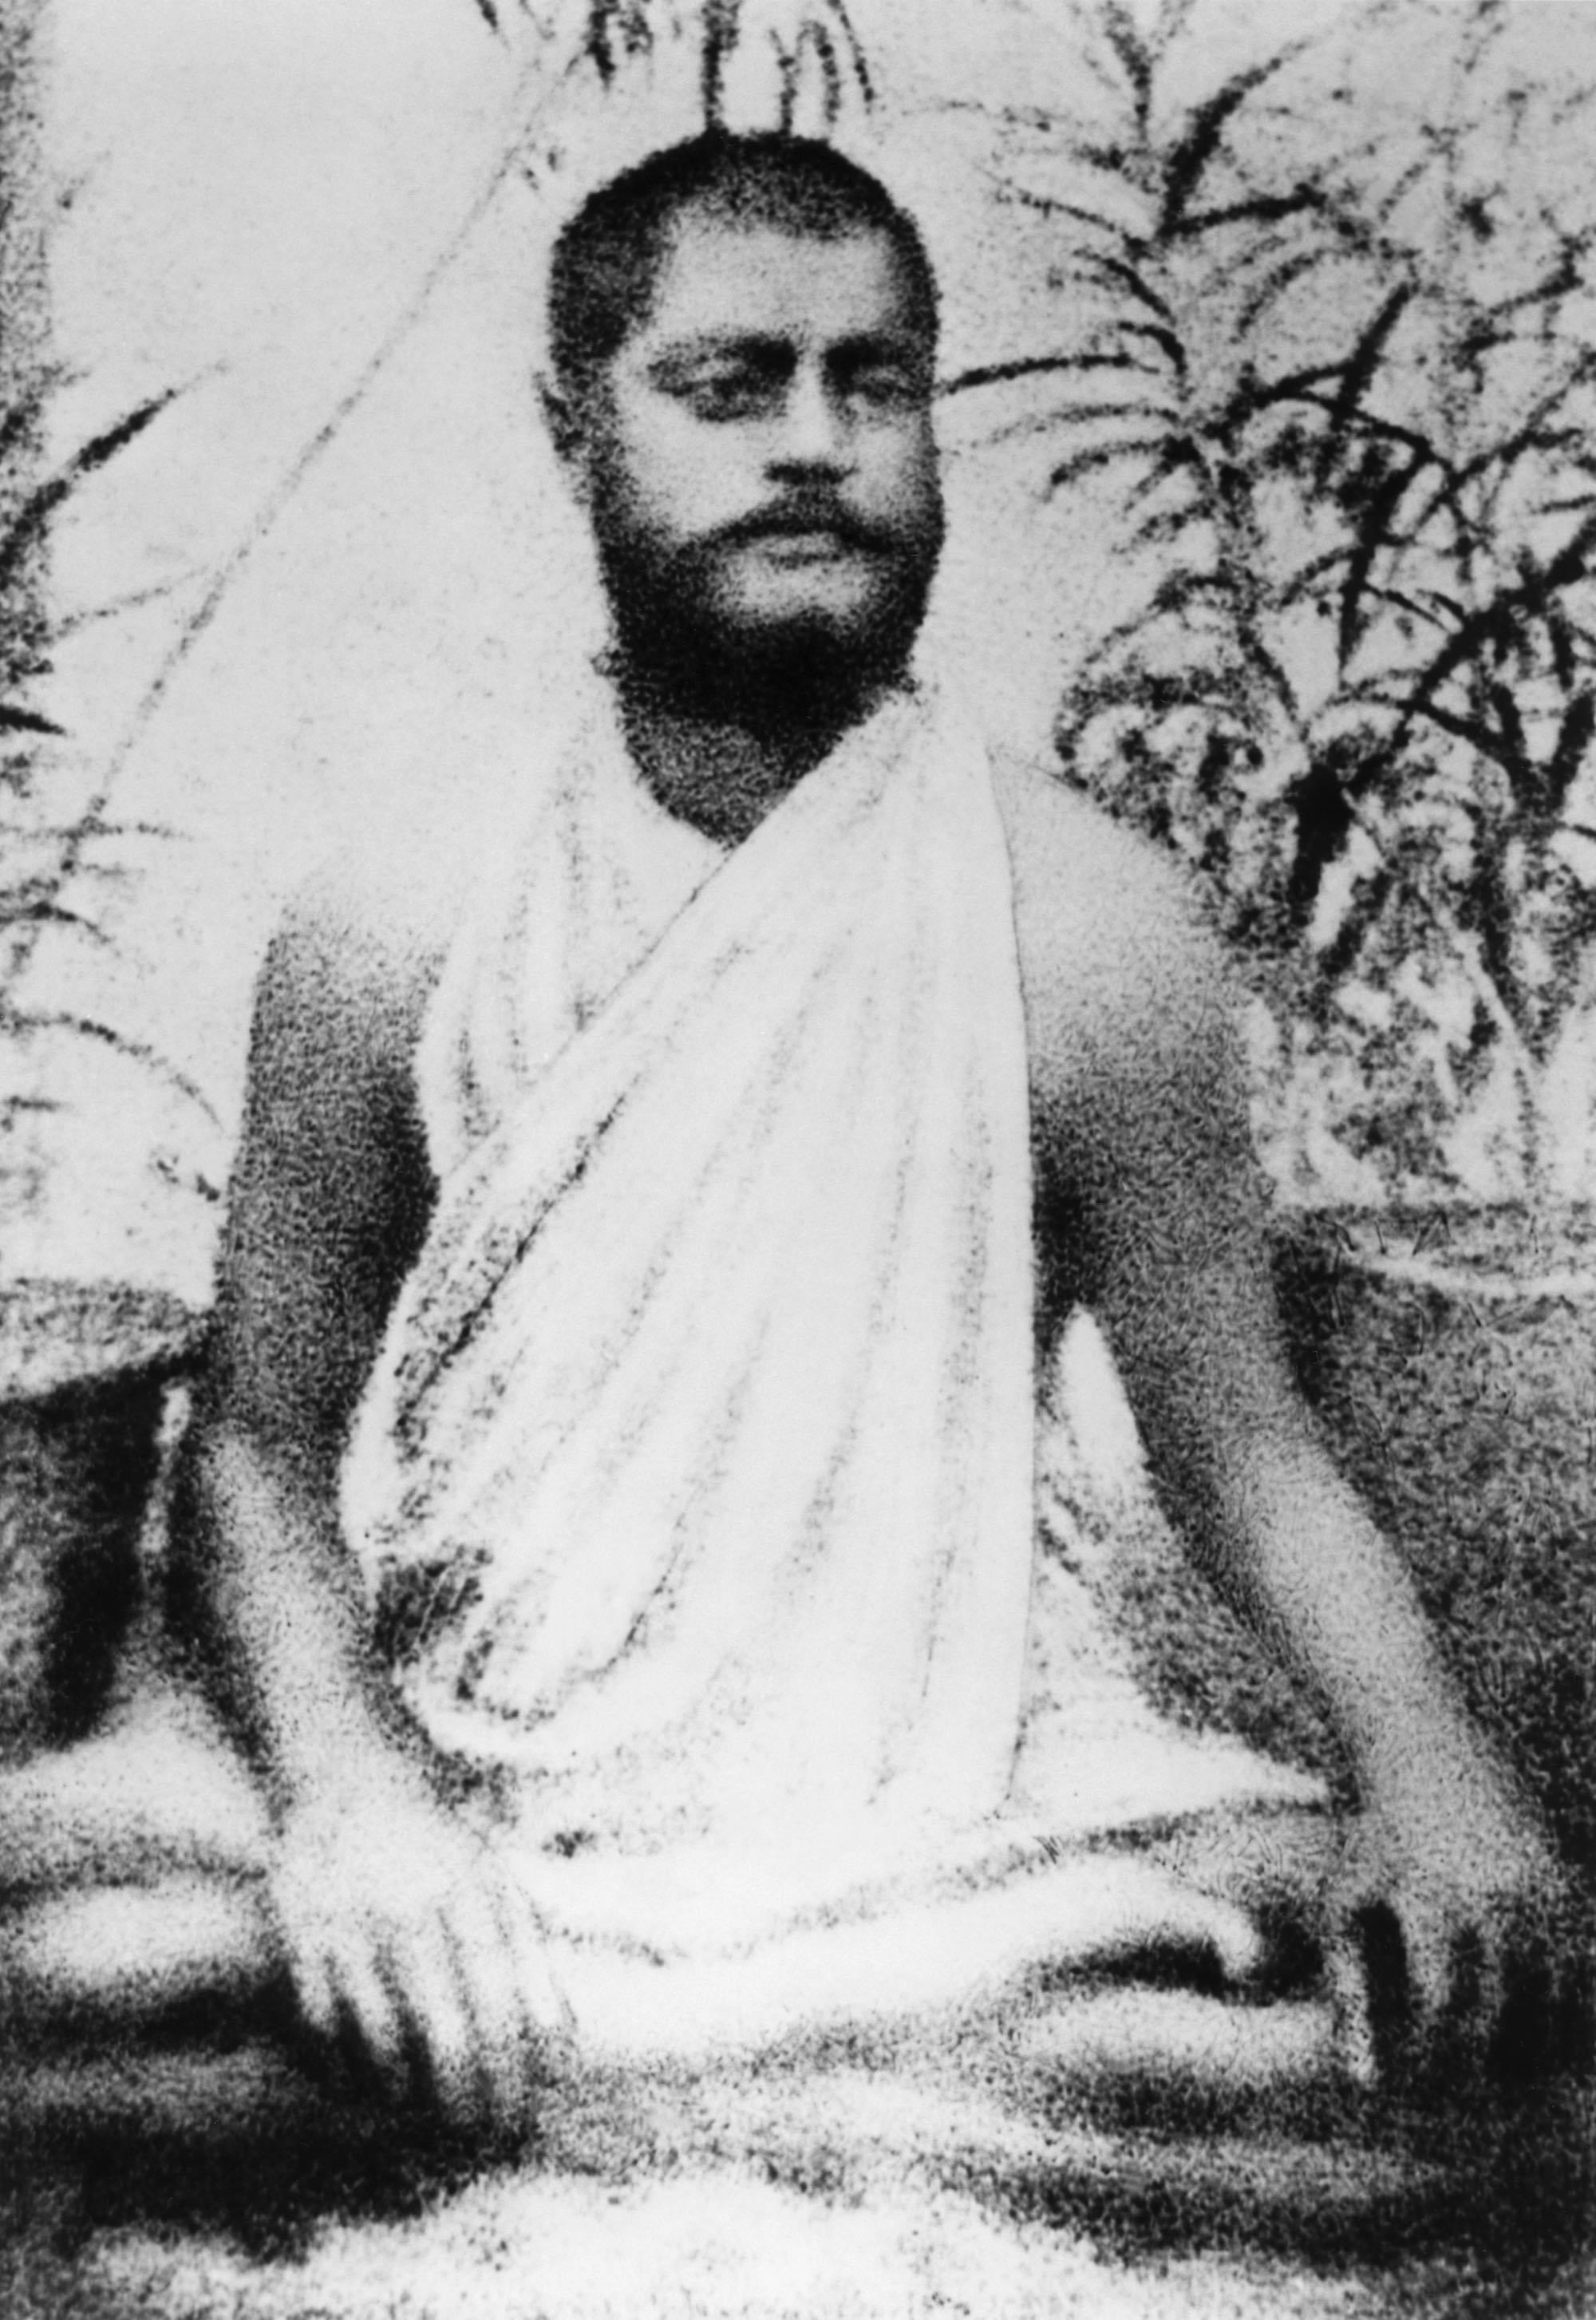 (#1) Kolkata 1886